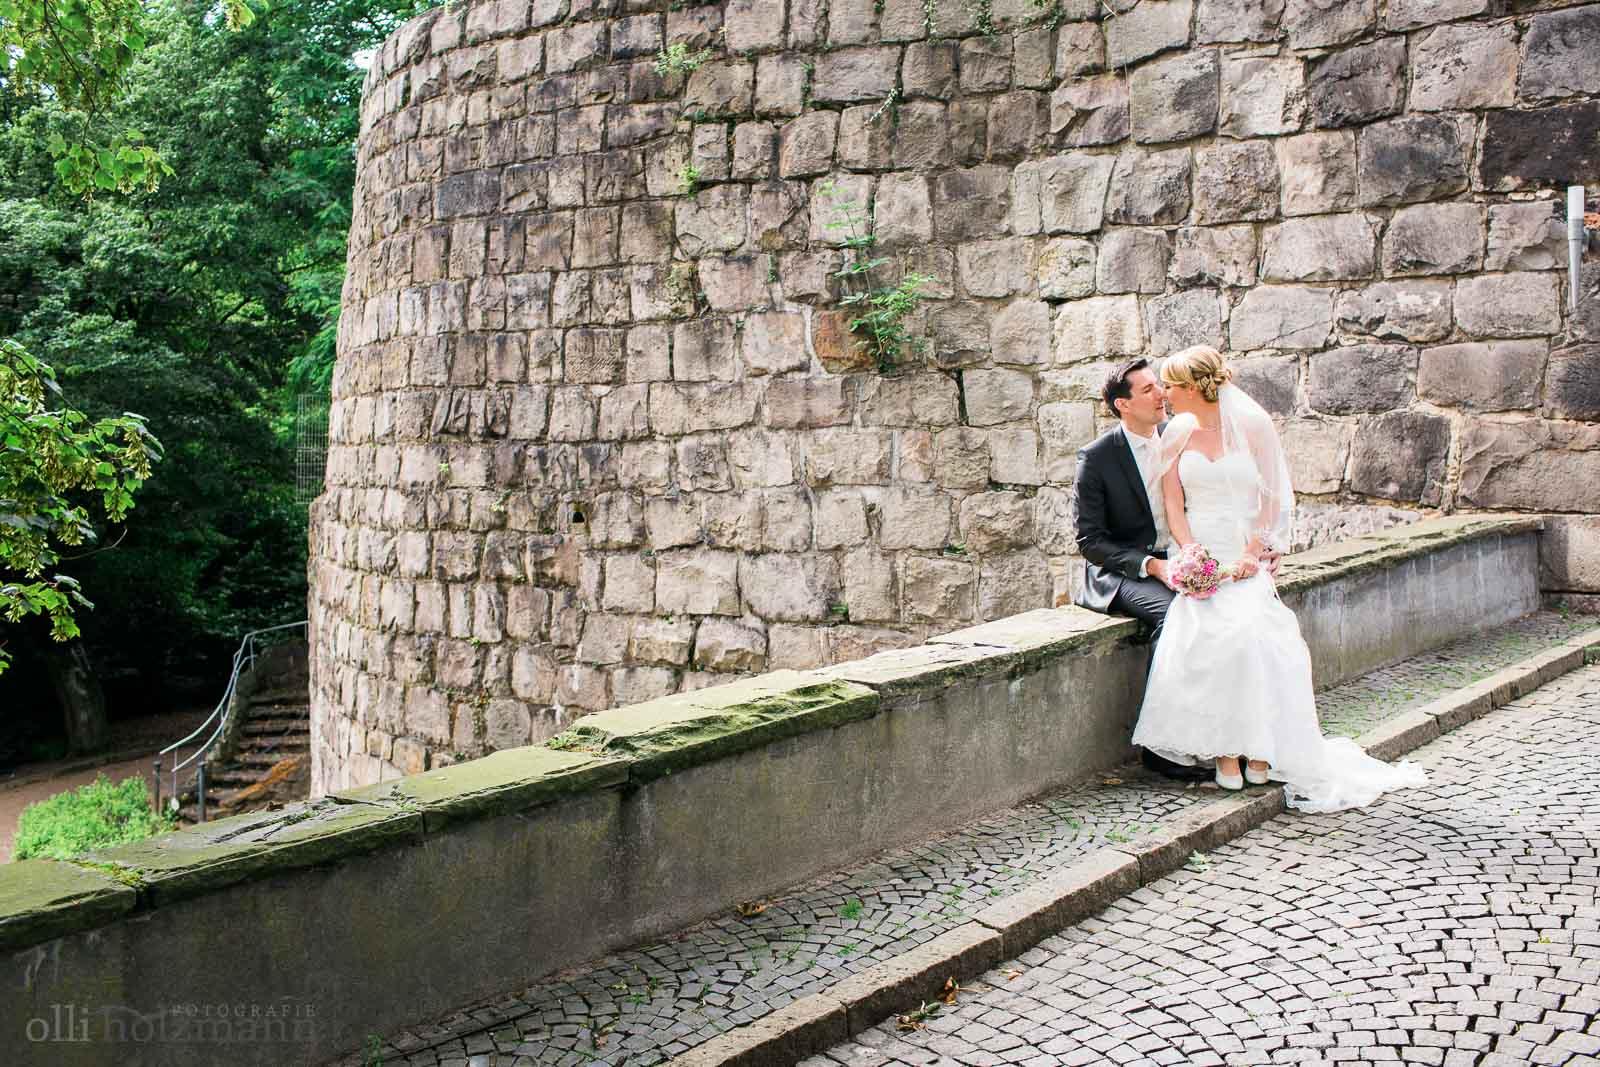 Hochzeitsfotograf nrw-73.jpg